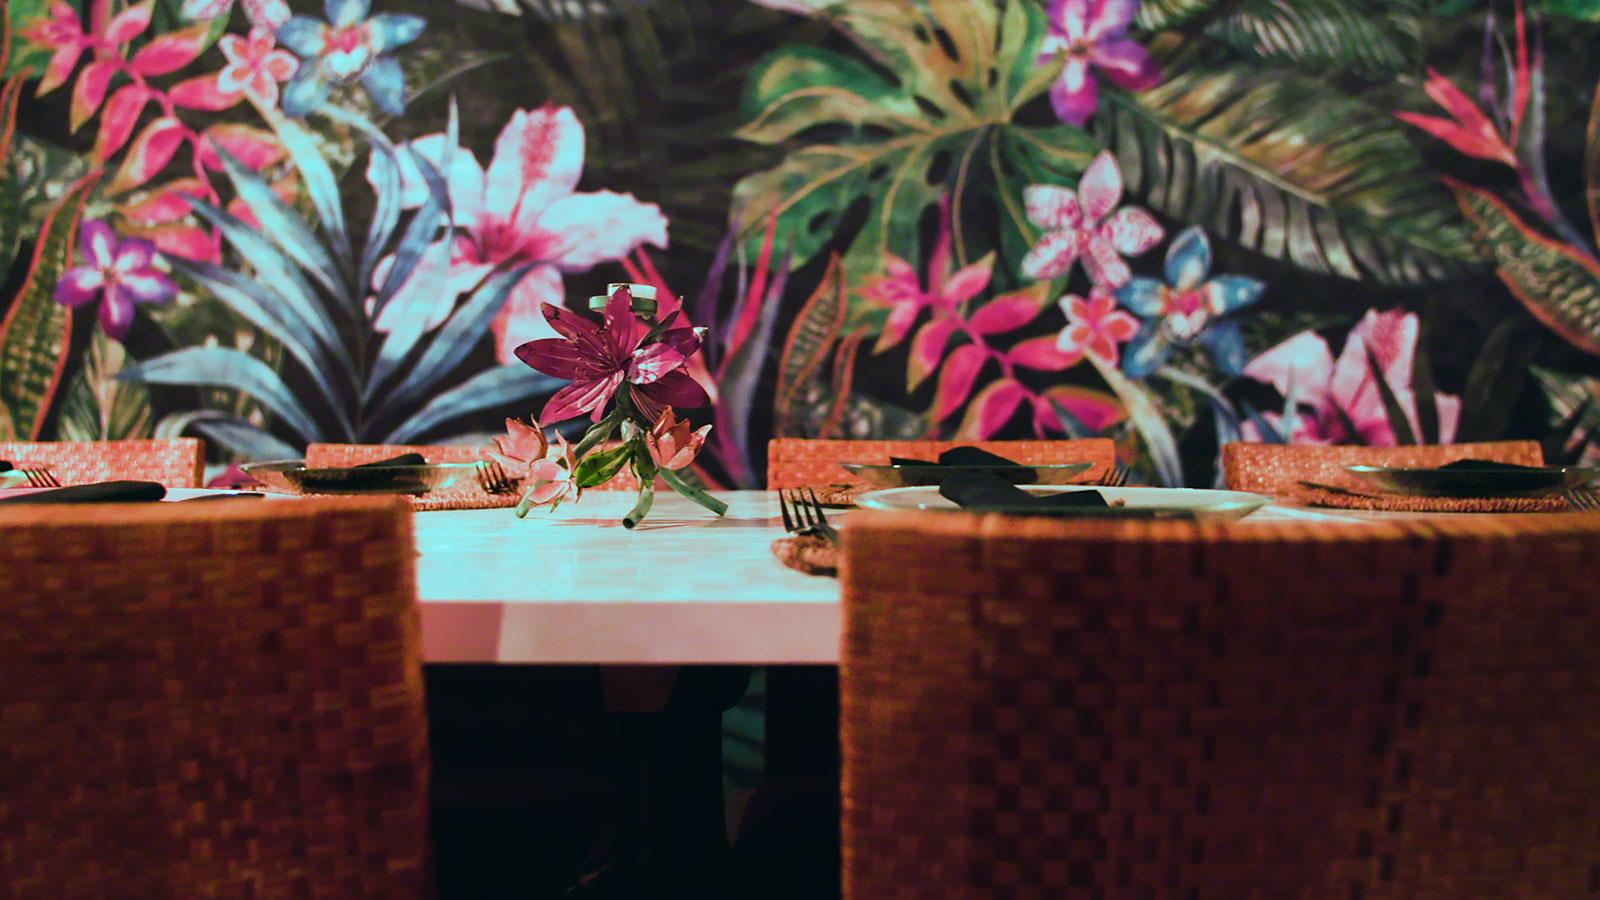 https://juanpablolucena.com/wp-content/uploads/2019/02/restaurante_amaltea_13-2.jpg